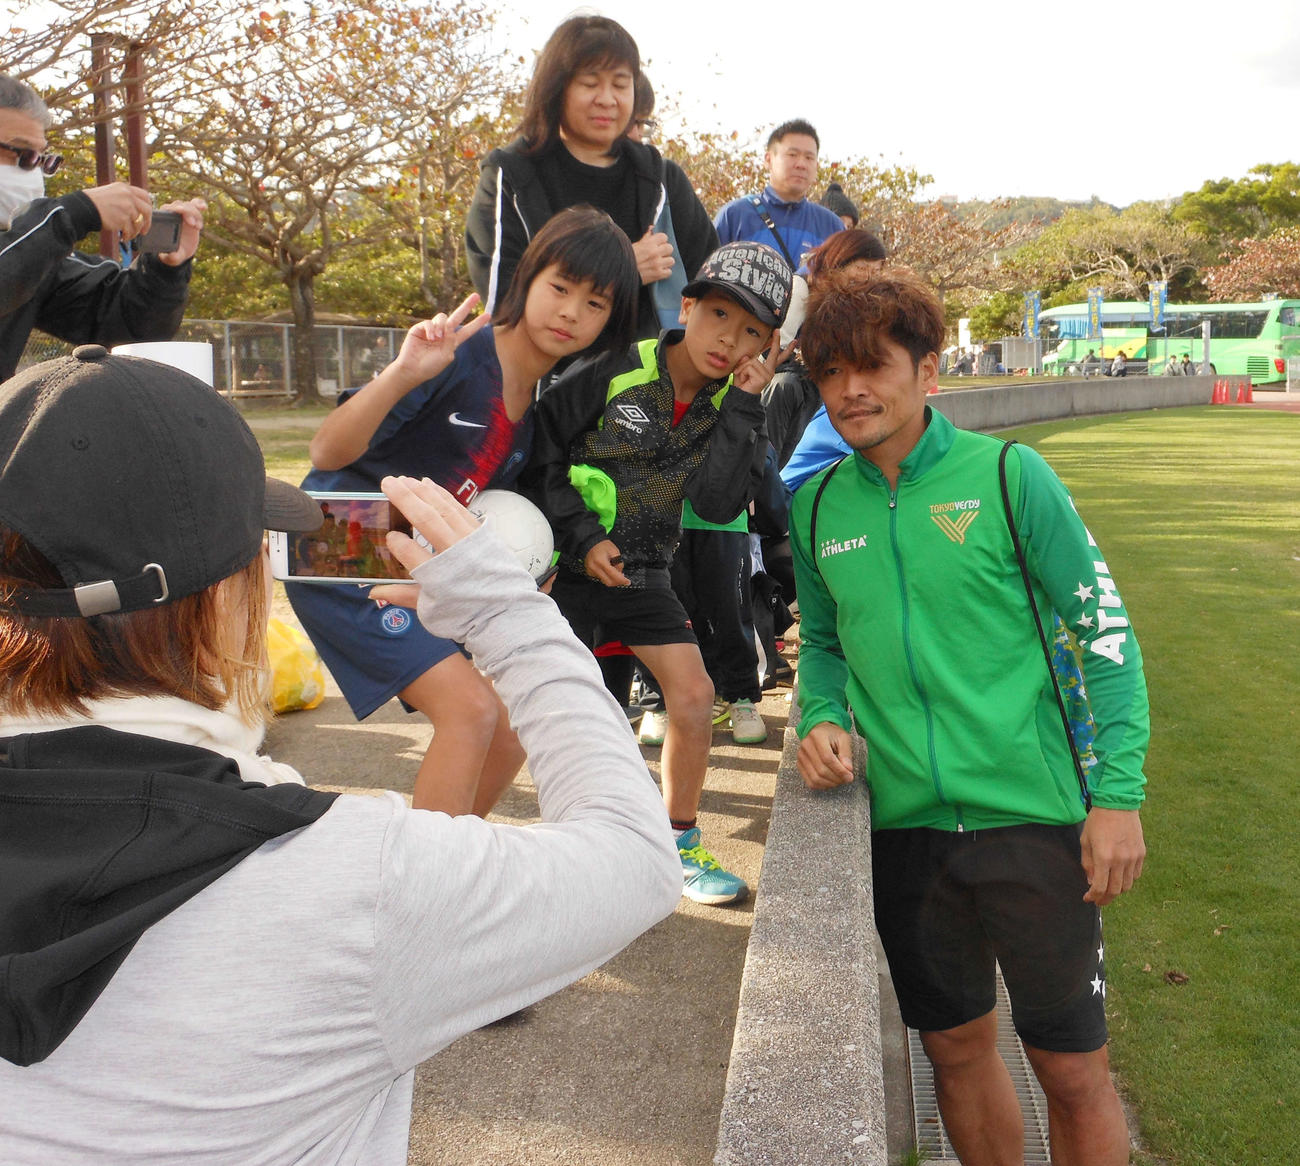 G大阪との練習試合に出場した東京V・FW大久保はファンと記念写真に納まる(撮影・横田和幸)